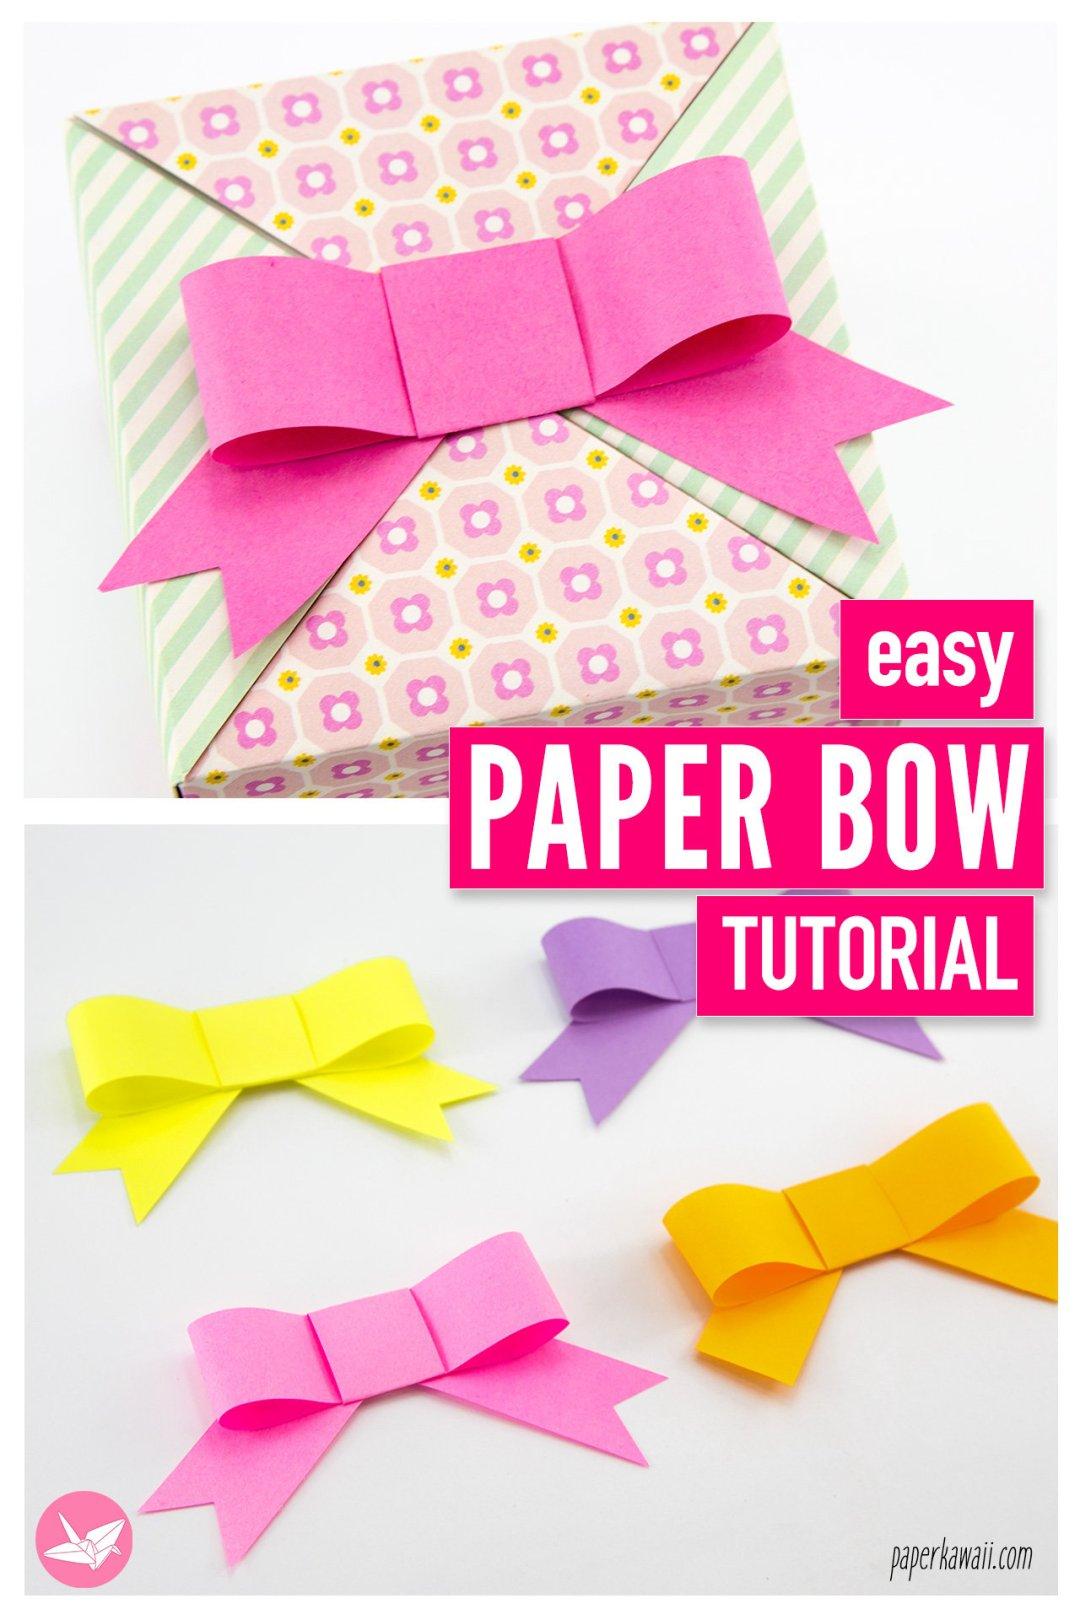 Easy Paper Bow Tutorial via @paper_kawaii